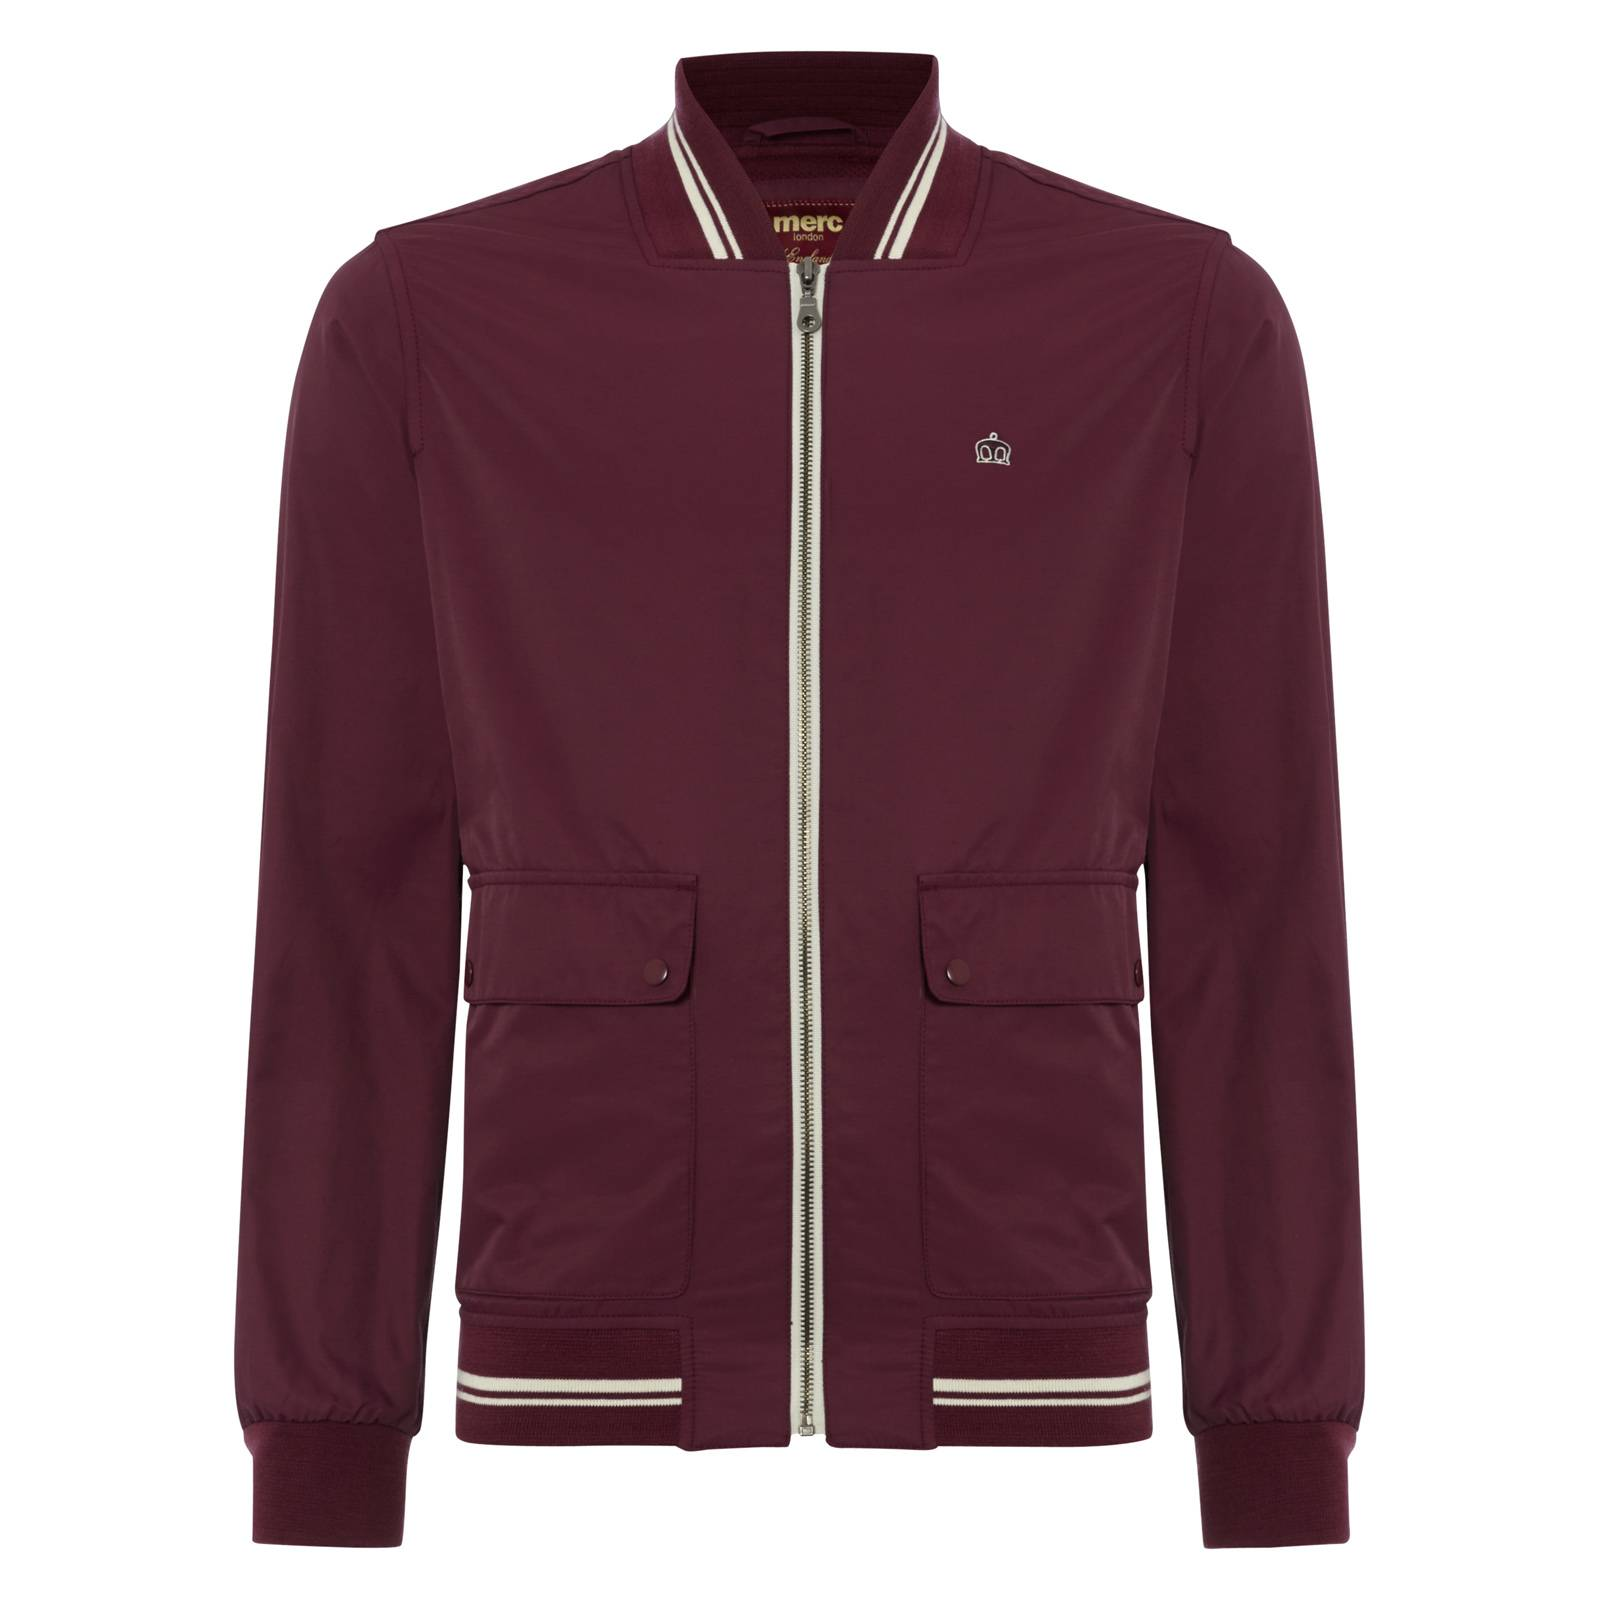 Куртка CampbellКуртки под заказ<br><br><br>Артикул: 1114101<br>Материал: 54% хлопок, 46% нейлон<br>Цвет: вишневый<br>Пол: Мужской